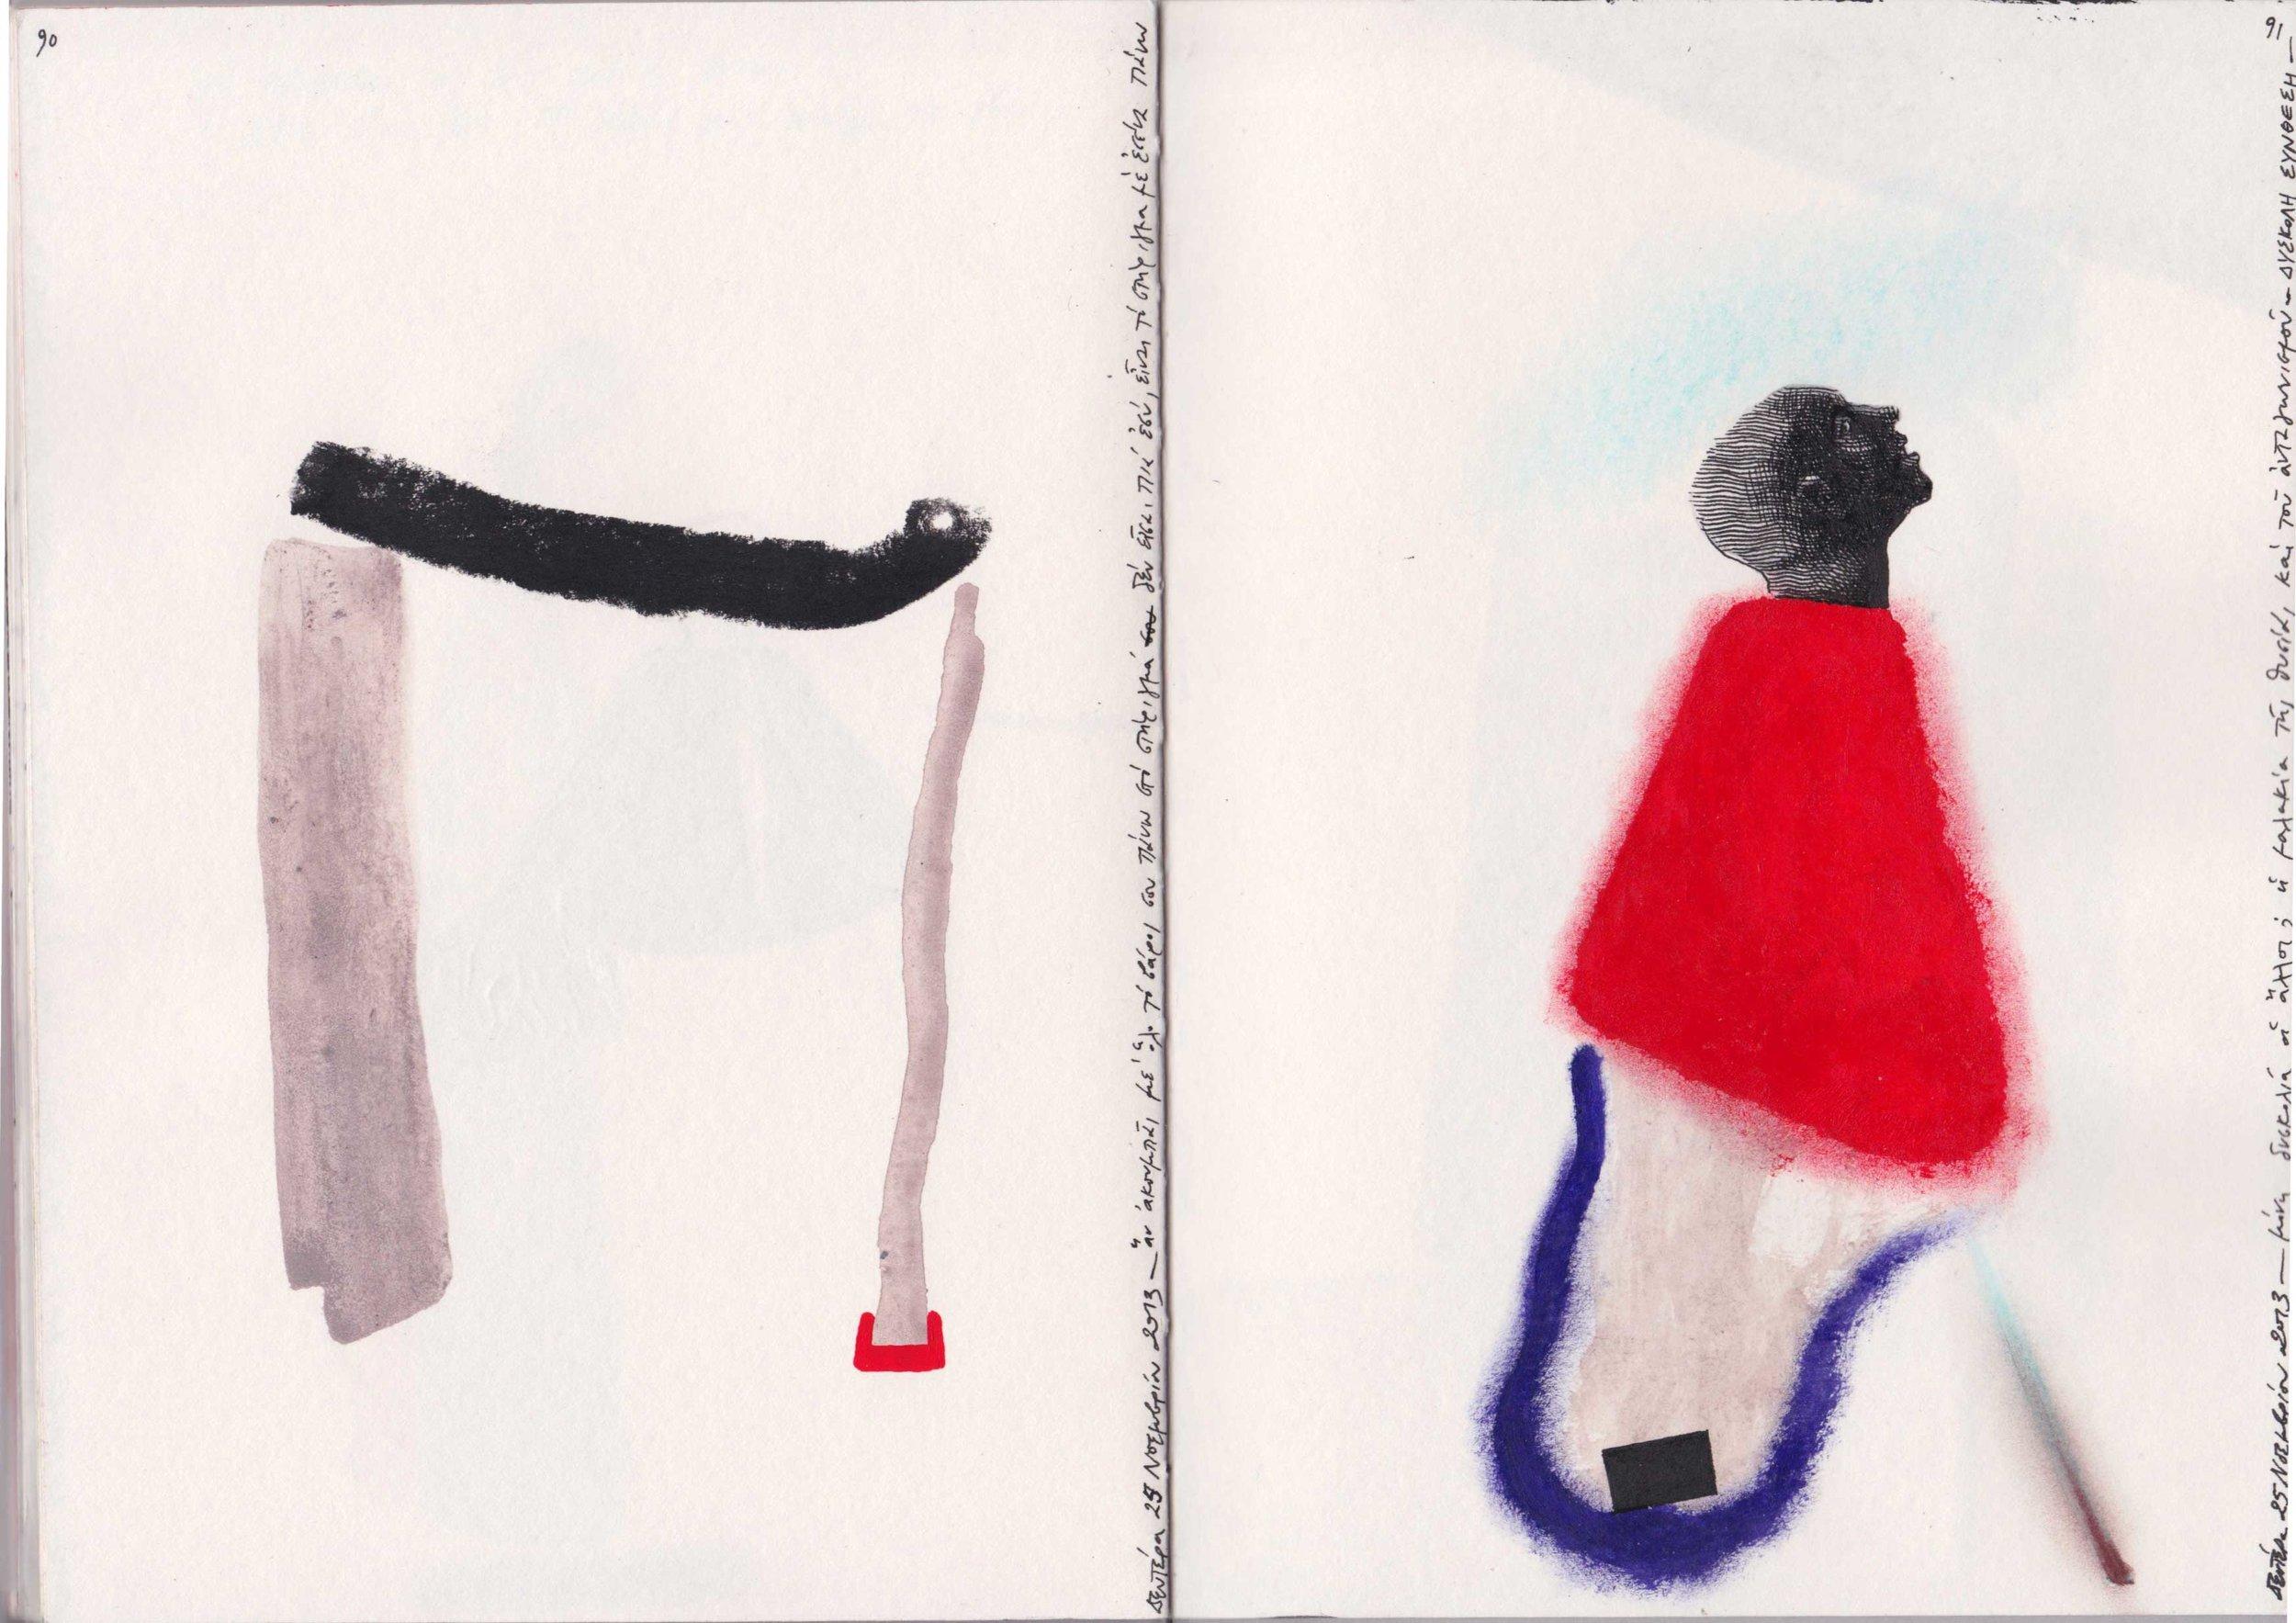 diary 15 page 90-91